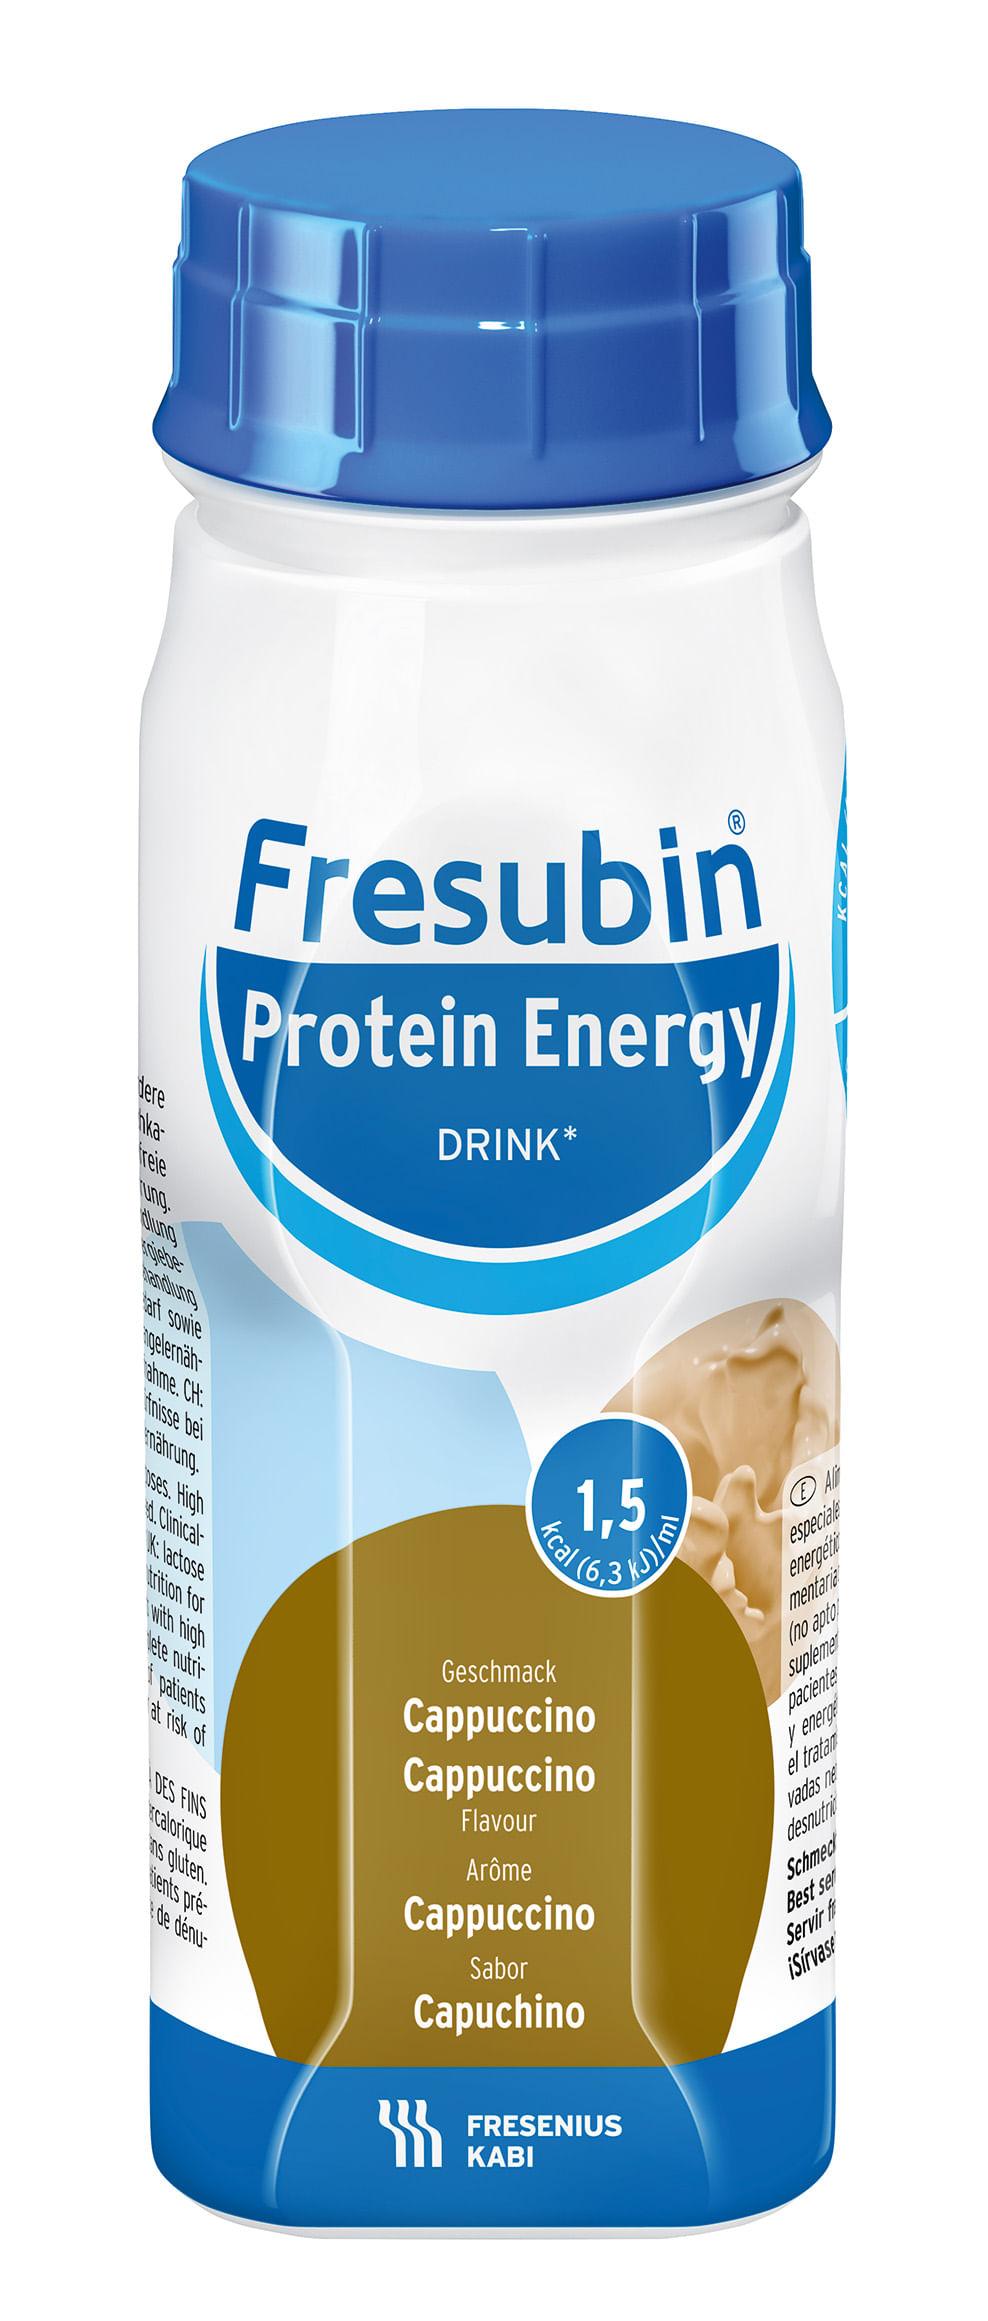 Fresubin_Protein_Energy_Cappuccino_EBo_Frontal